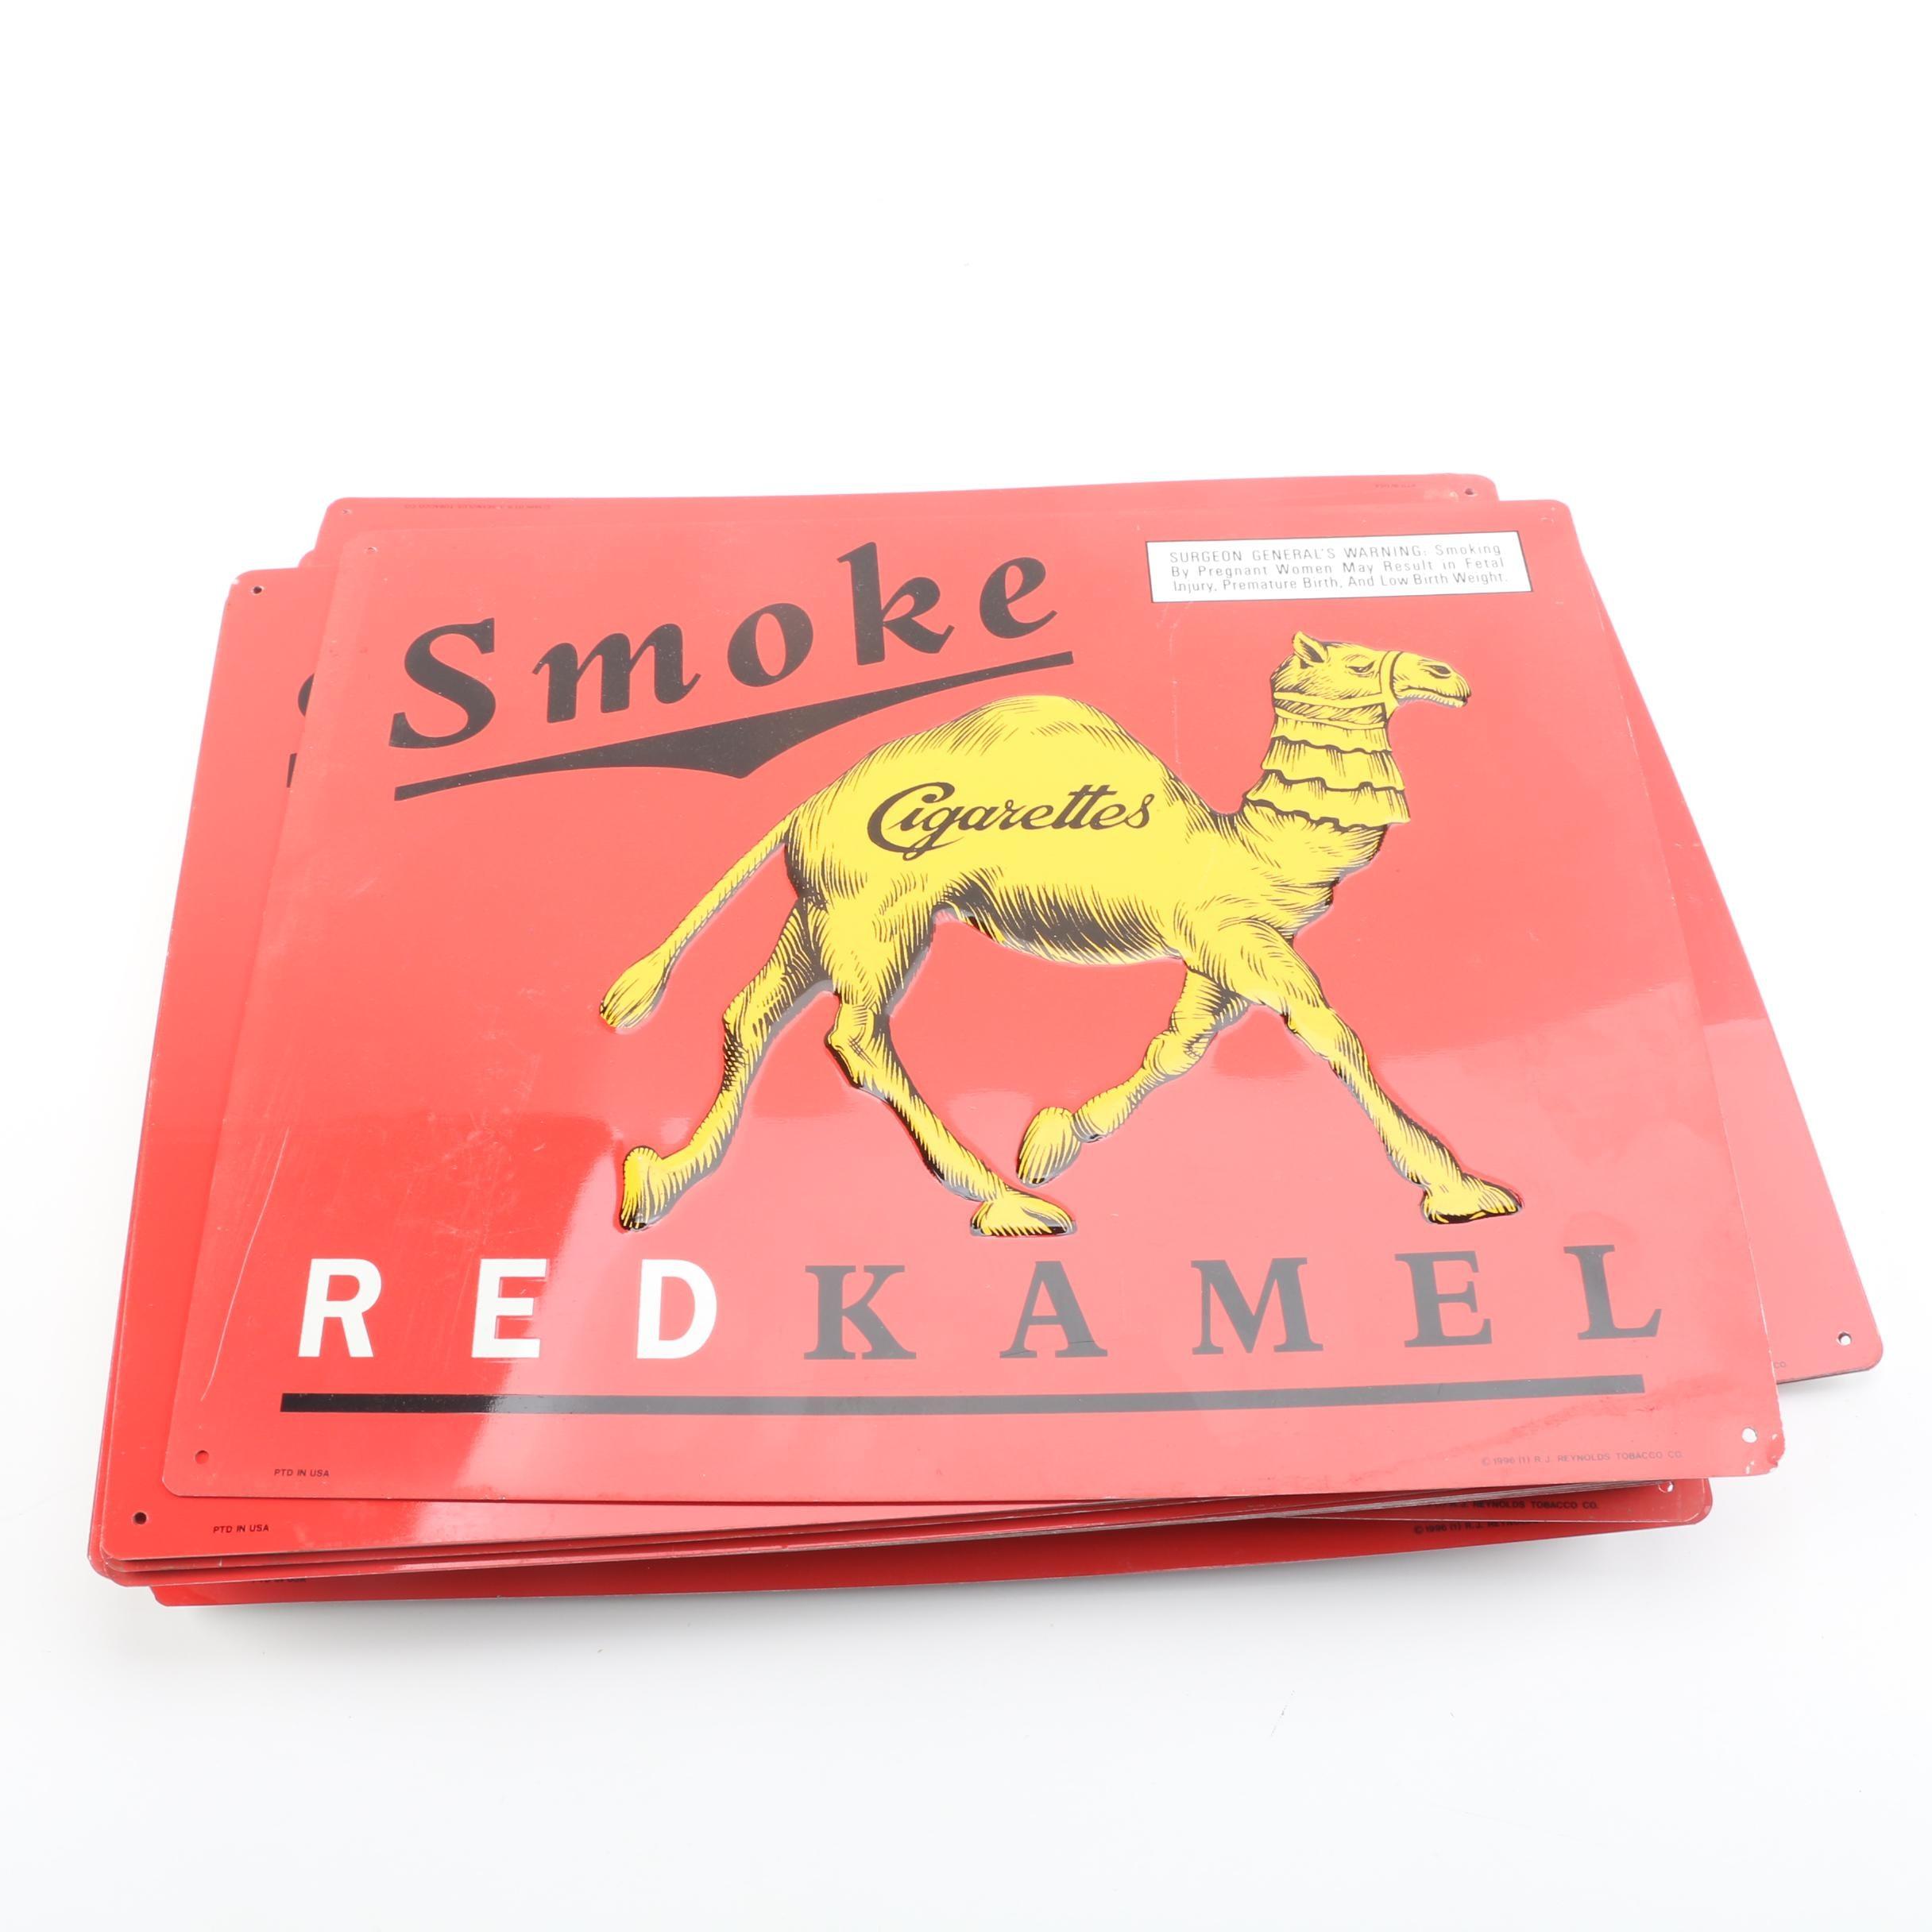 Thirty-Six 1996 Red Kamel Cigarette Metal Signs